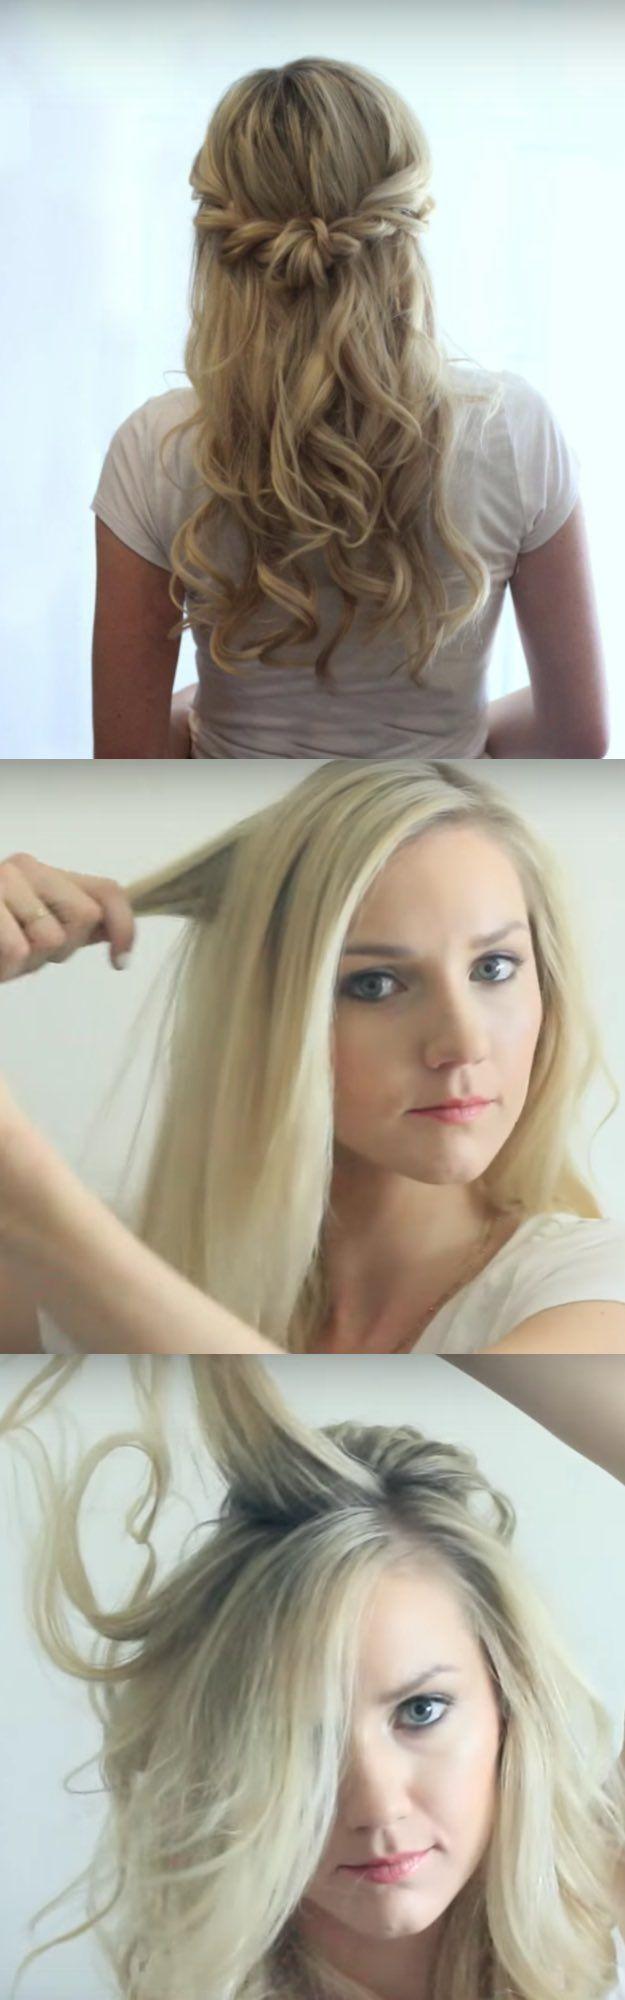 easy halfup halfdown hairstyle tutorials for prom crown